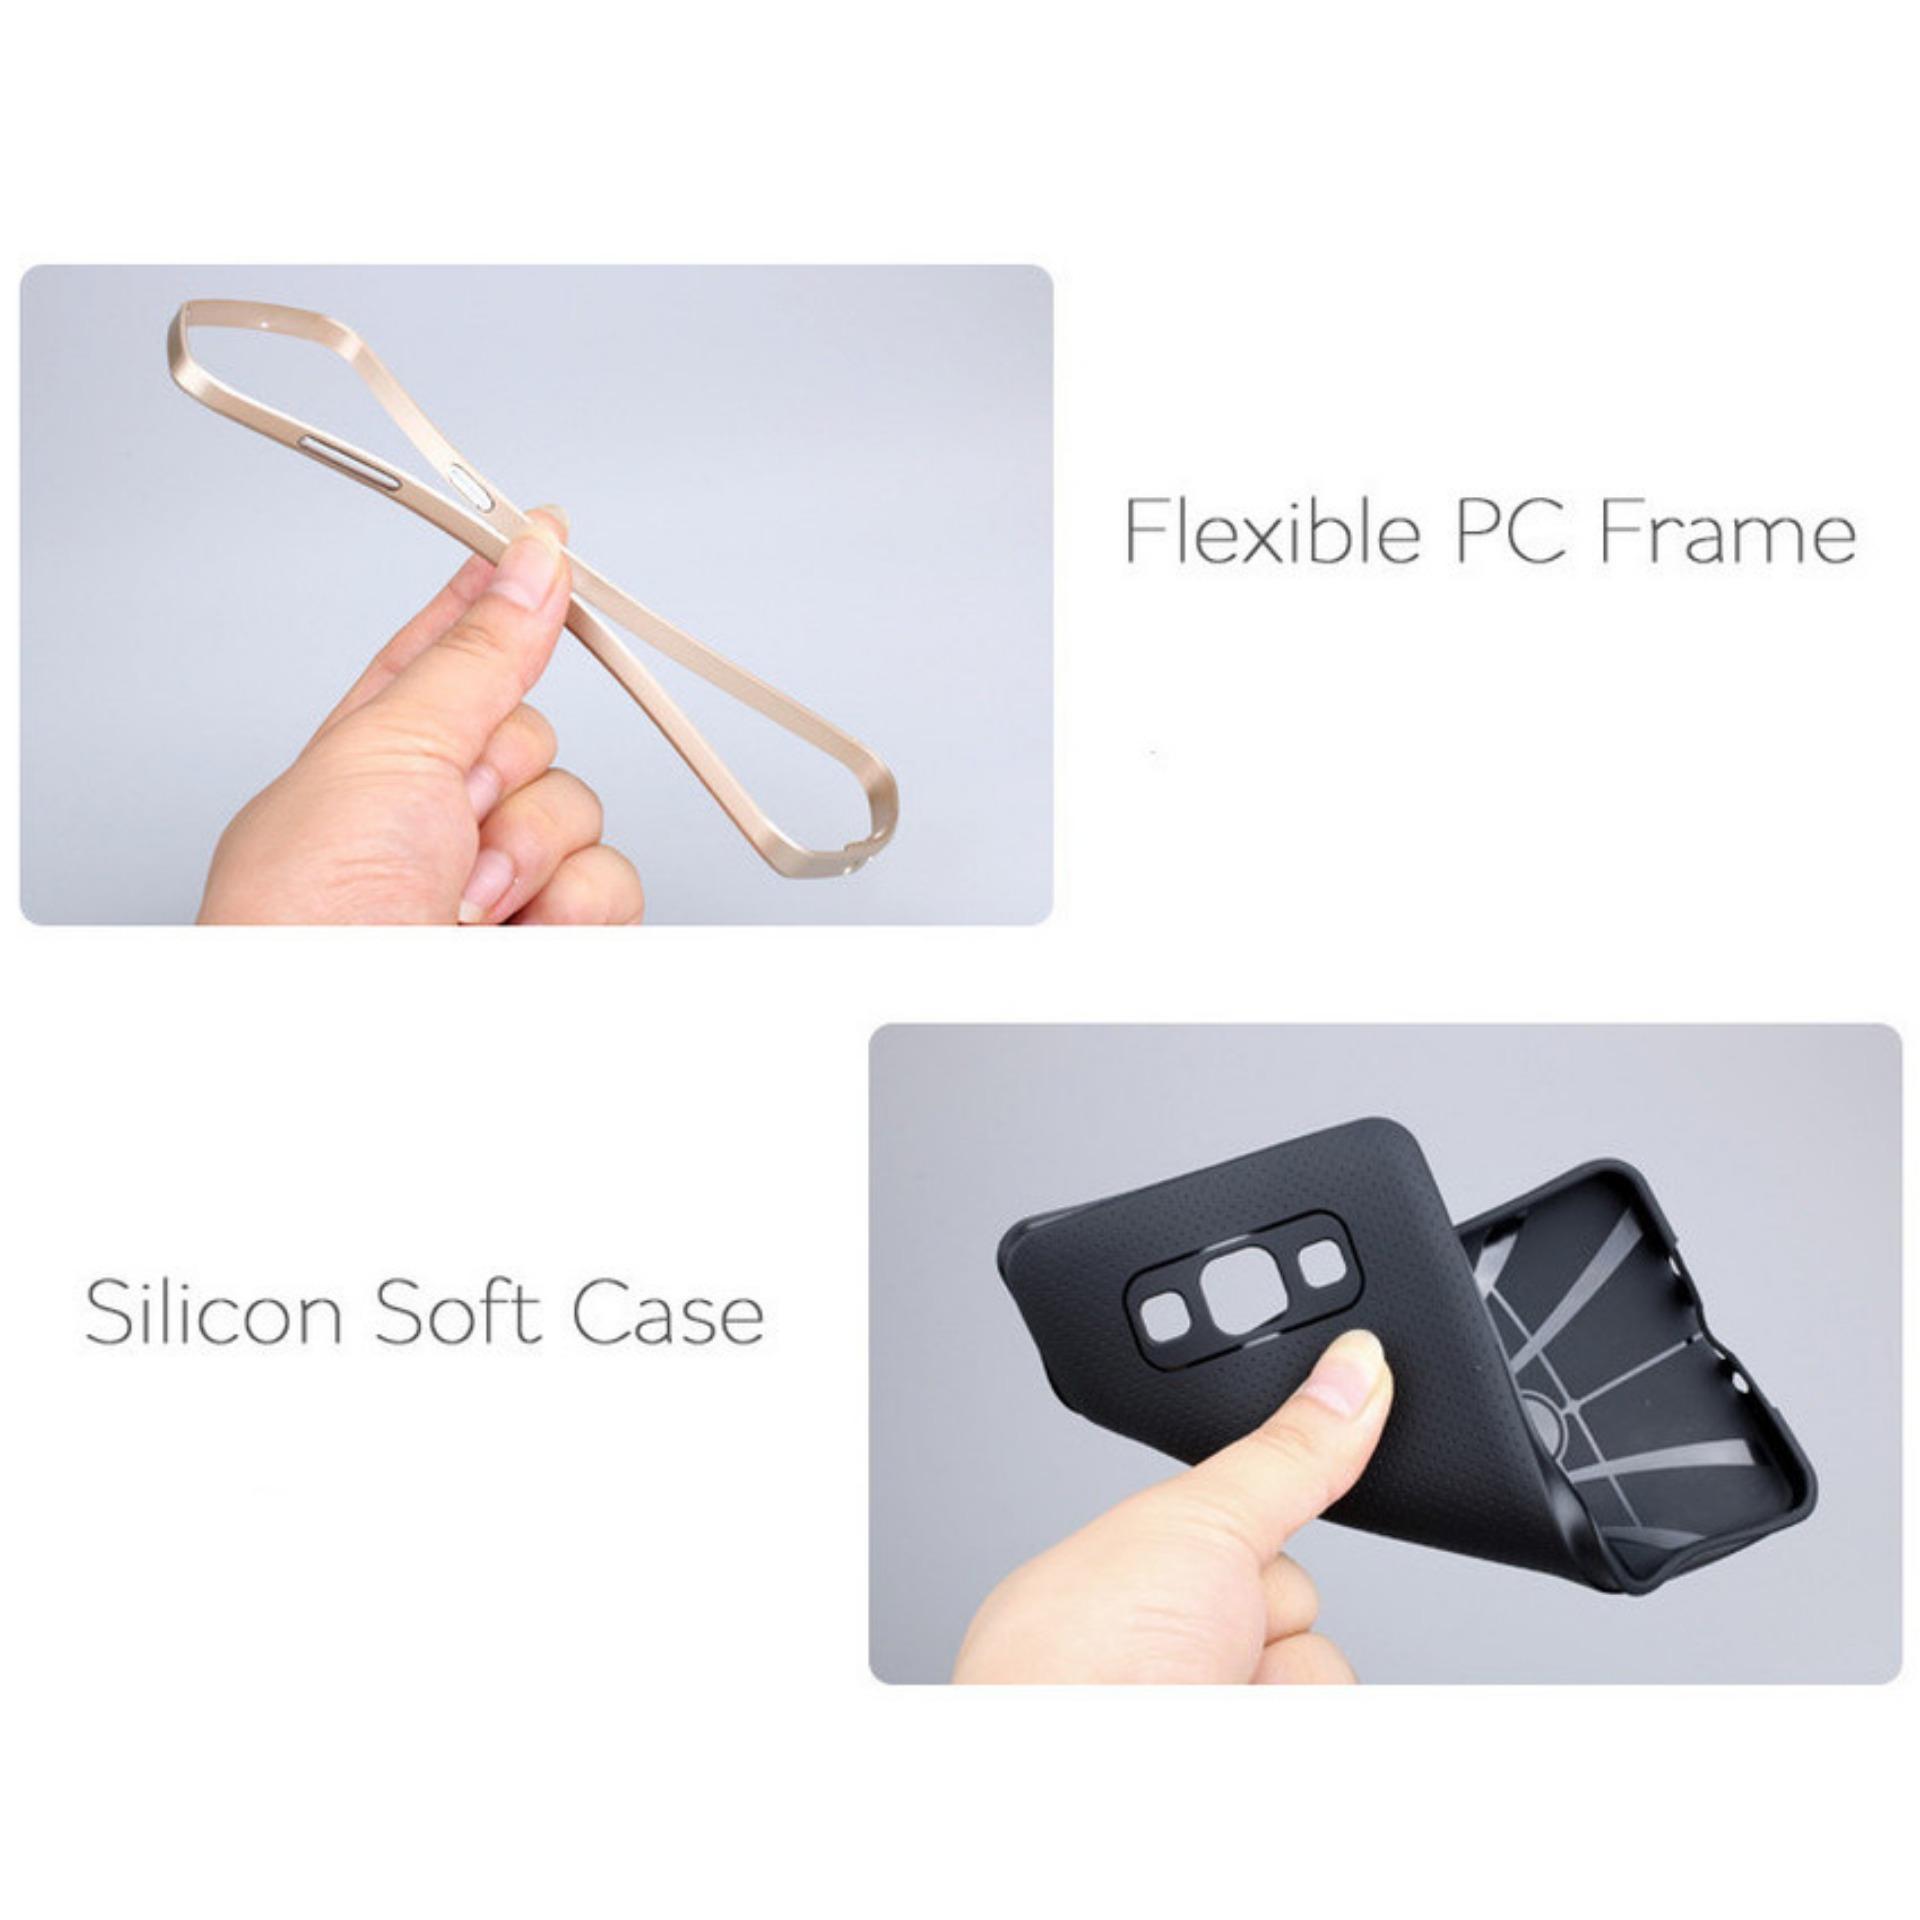 Casing Procase Ipaky Untuk Xiaomi Redmi 3s / 3 Pro Neo HybridSeries + Free Softcase Ultrathin ...